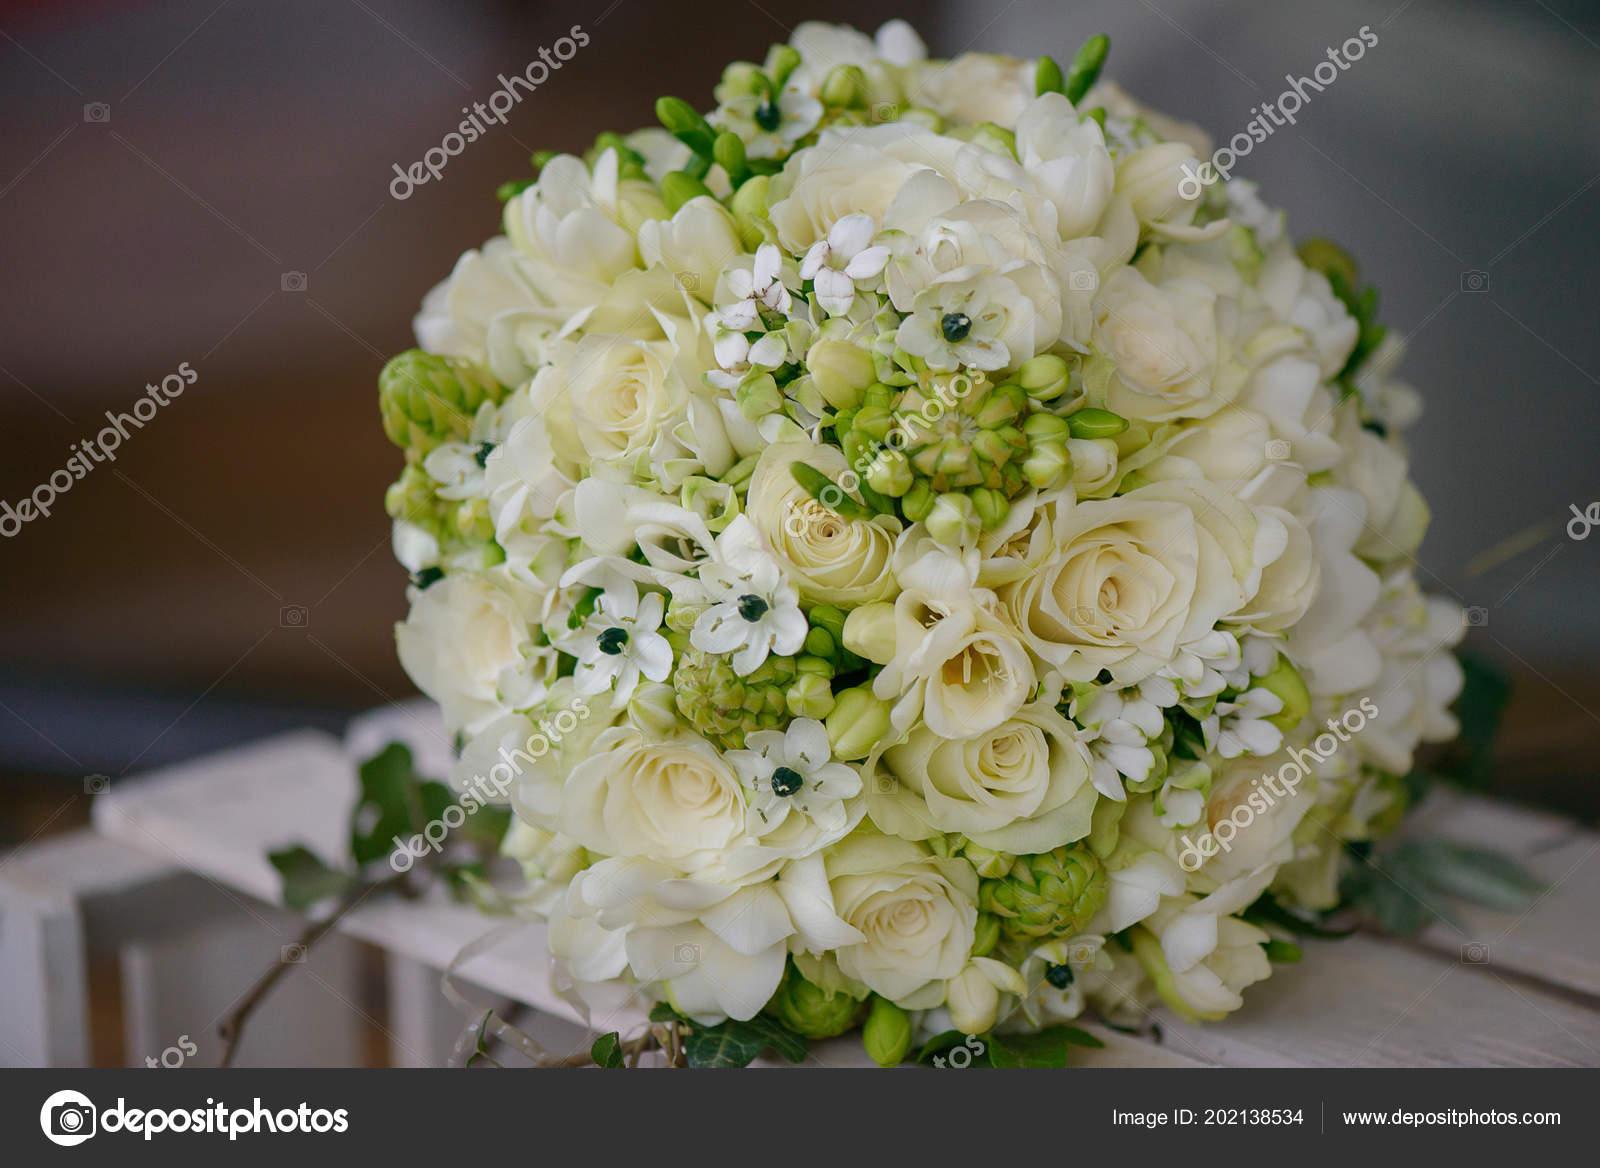 Bouquet Sposa Gelsomino.Vista Frontale Bouquet Sposa Con Rose Avorio Fresie Bianche Fiori